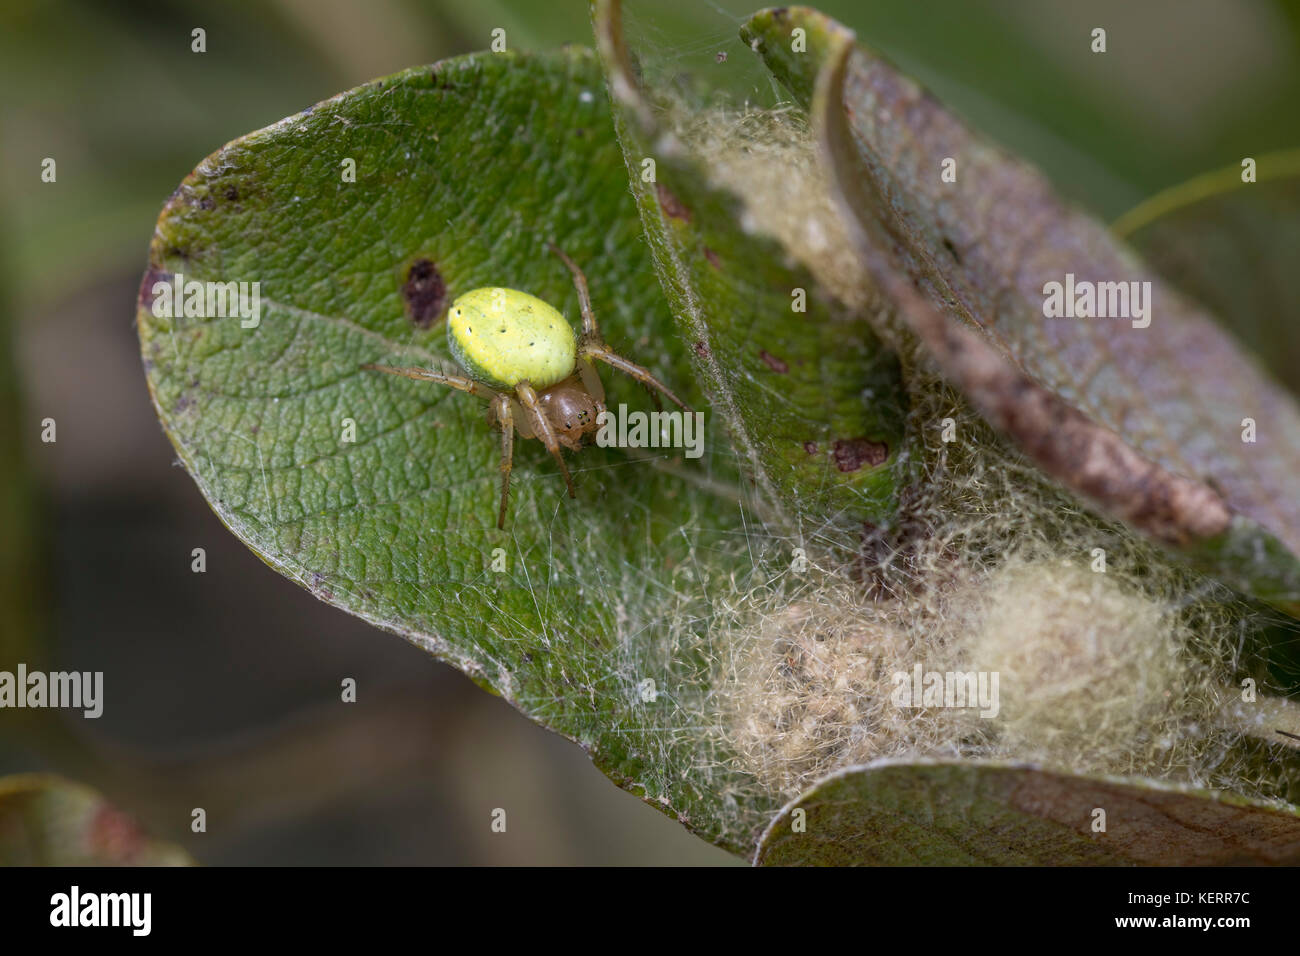 Cucumber Green Orb Web Spider; Araniella cucurbitina Single with Web on Leaf Cornwall; UK - Stock Image